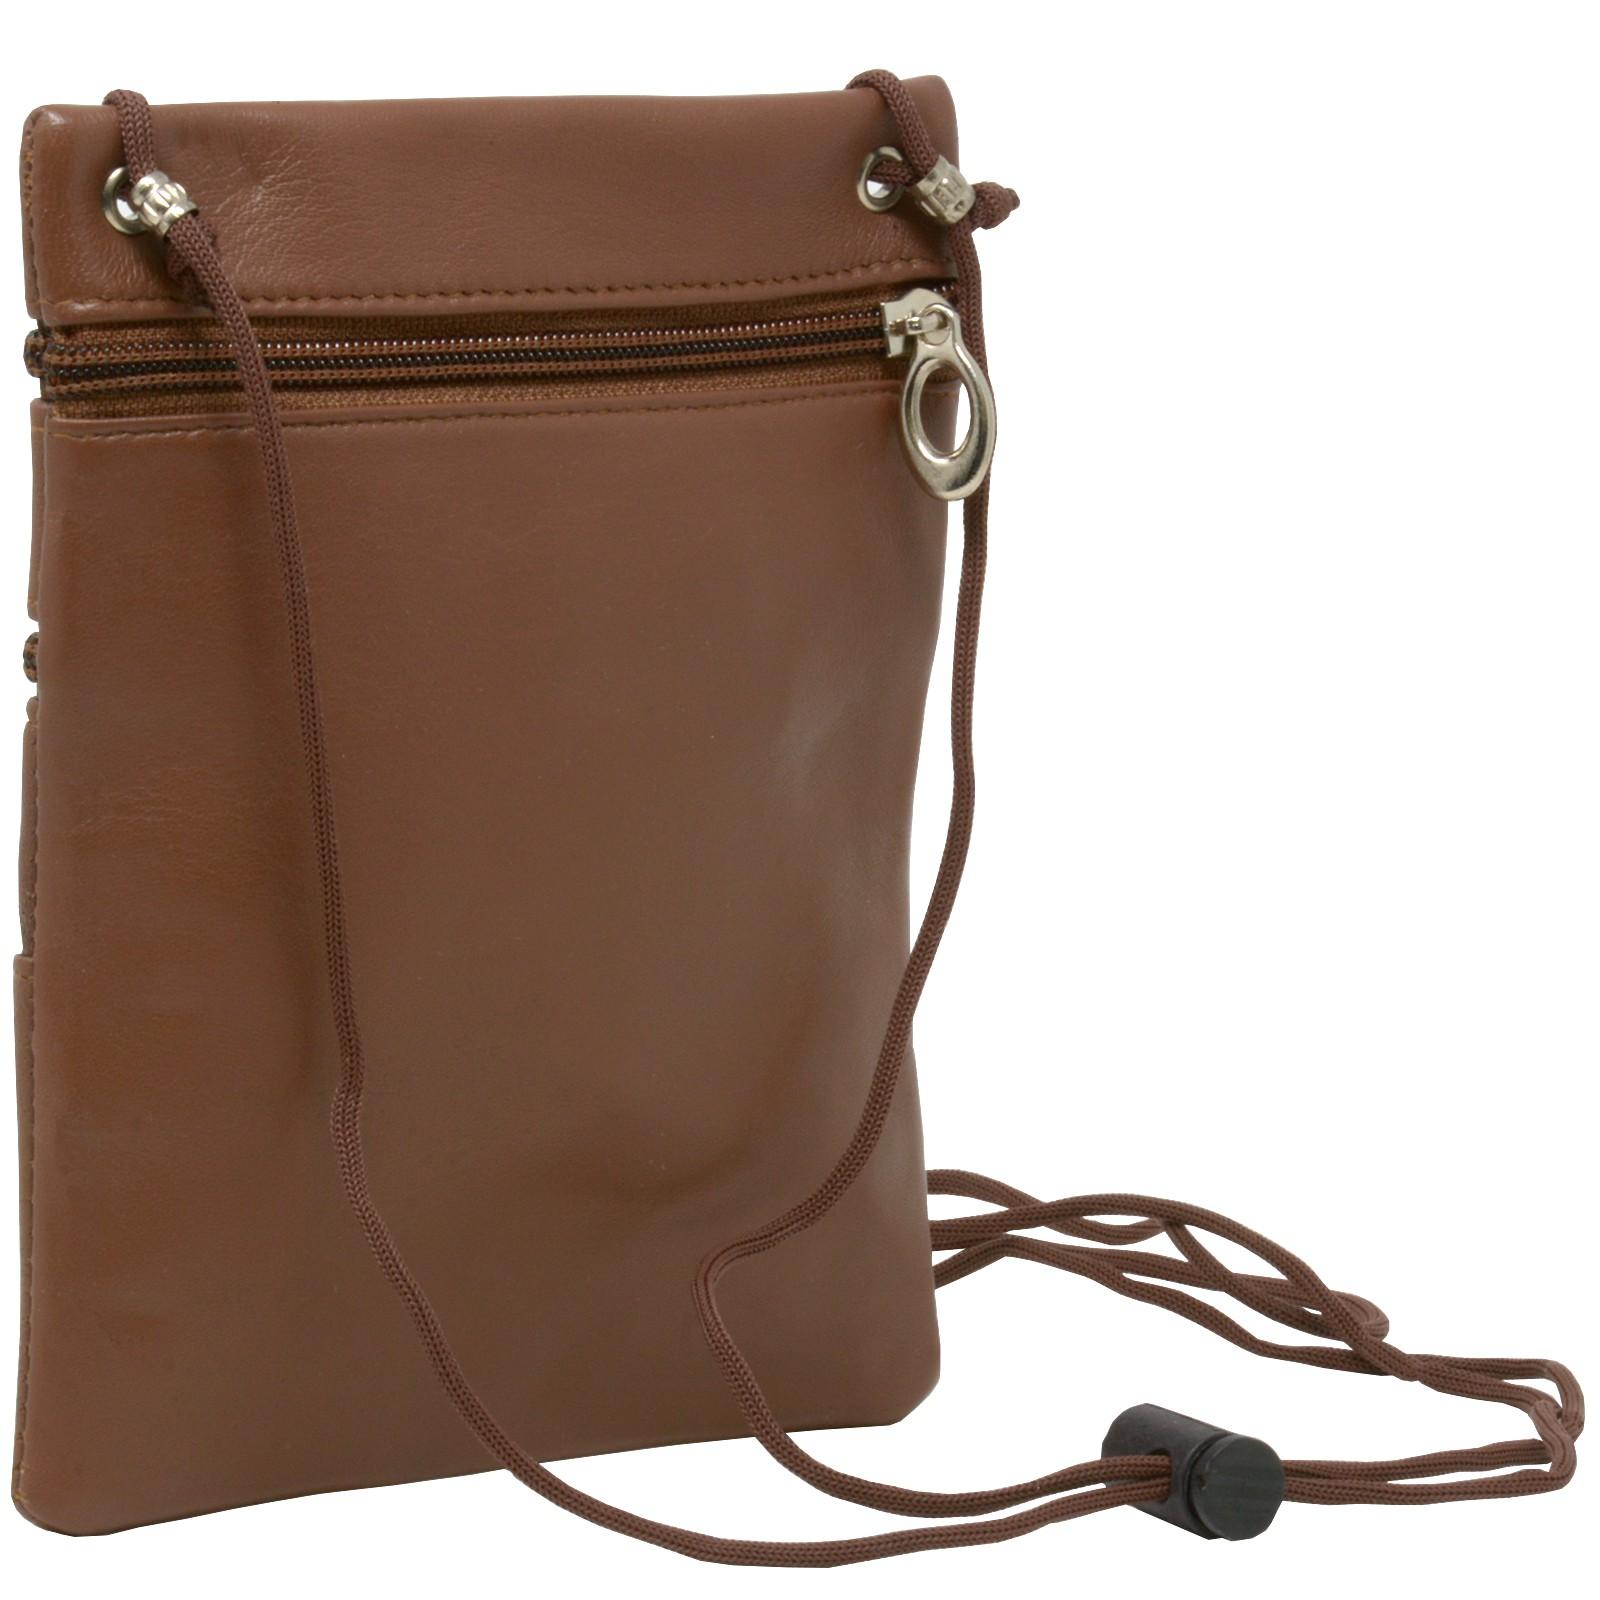 Soft-Leather-Purse-Organizer-Shoulder-Bag-4-Pocket-Micro-Handbag-Travel-Wallet thumbnail 17